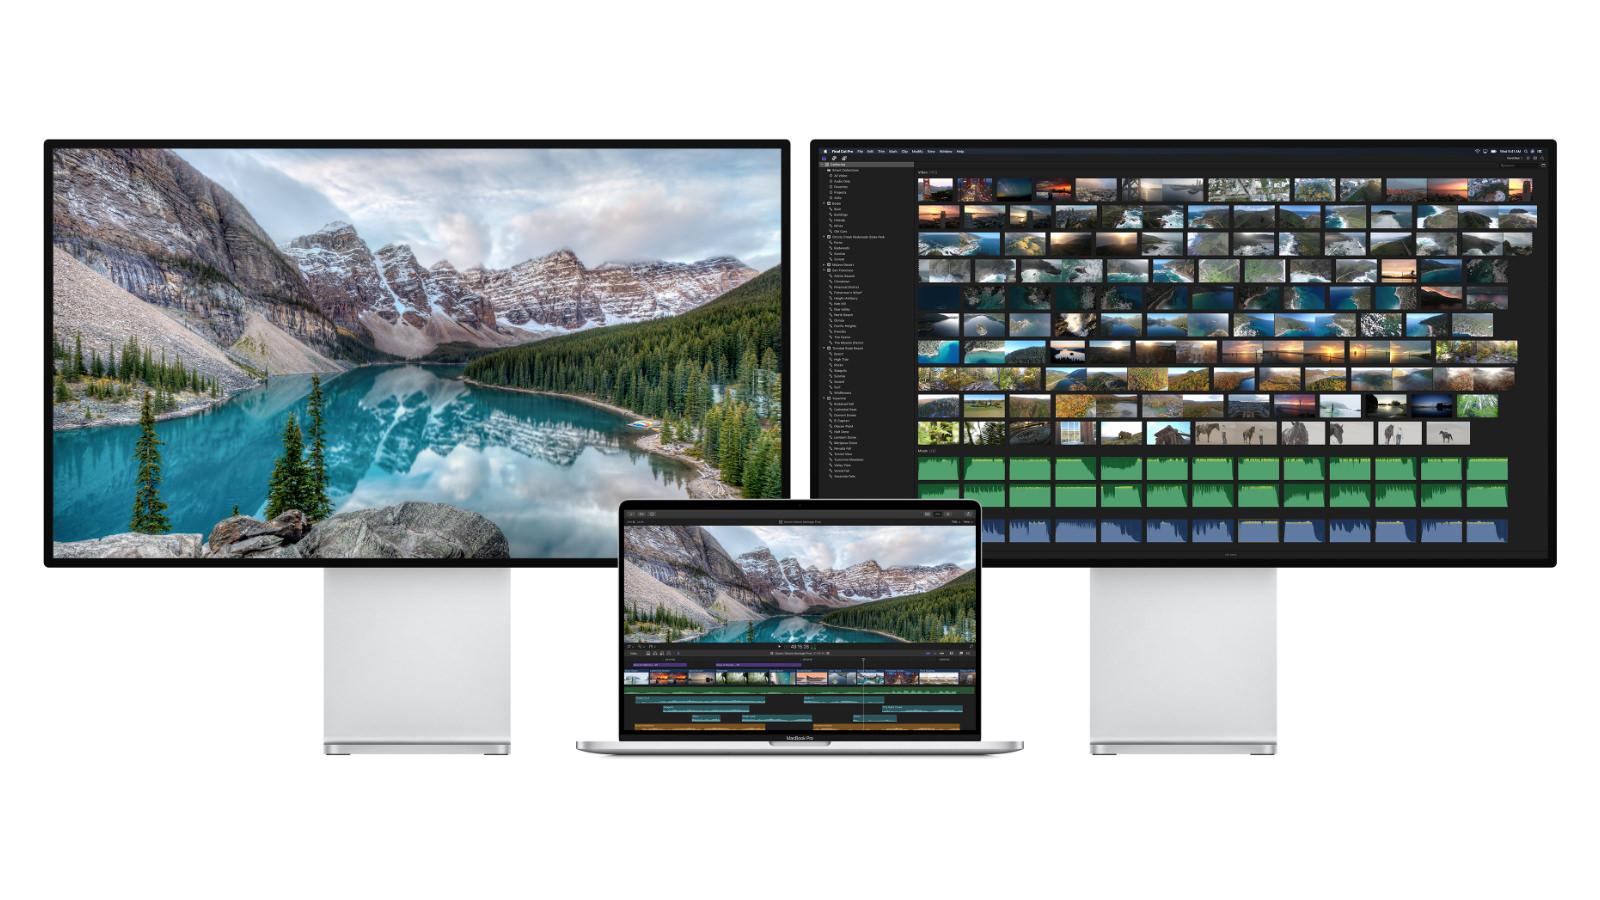 MacBookPro16inch-two-prodisplayxdr.jpg